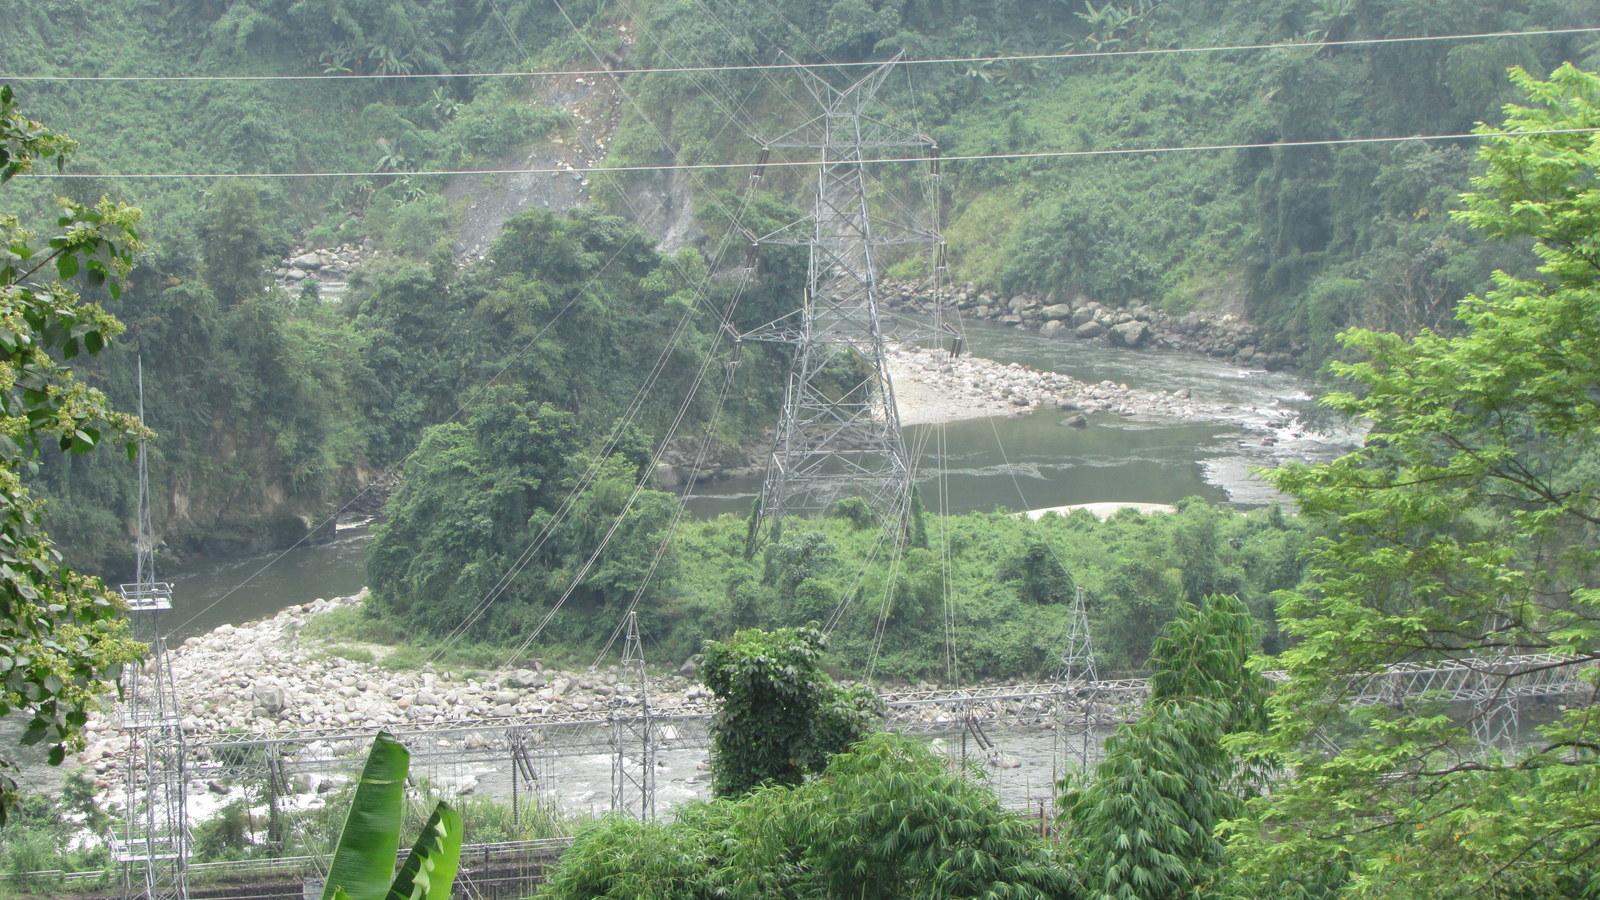 Dikrong Power Station at Hoz where water from Ranganadi HEP is released in Dikrong. Photo: Parag Jyoti Saikia